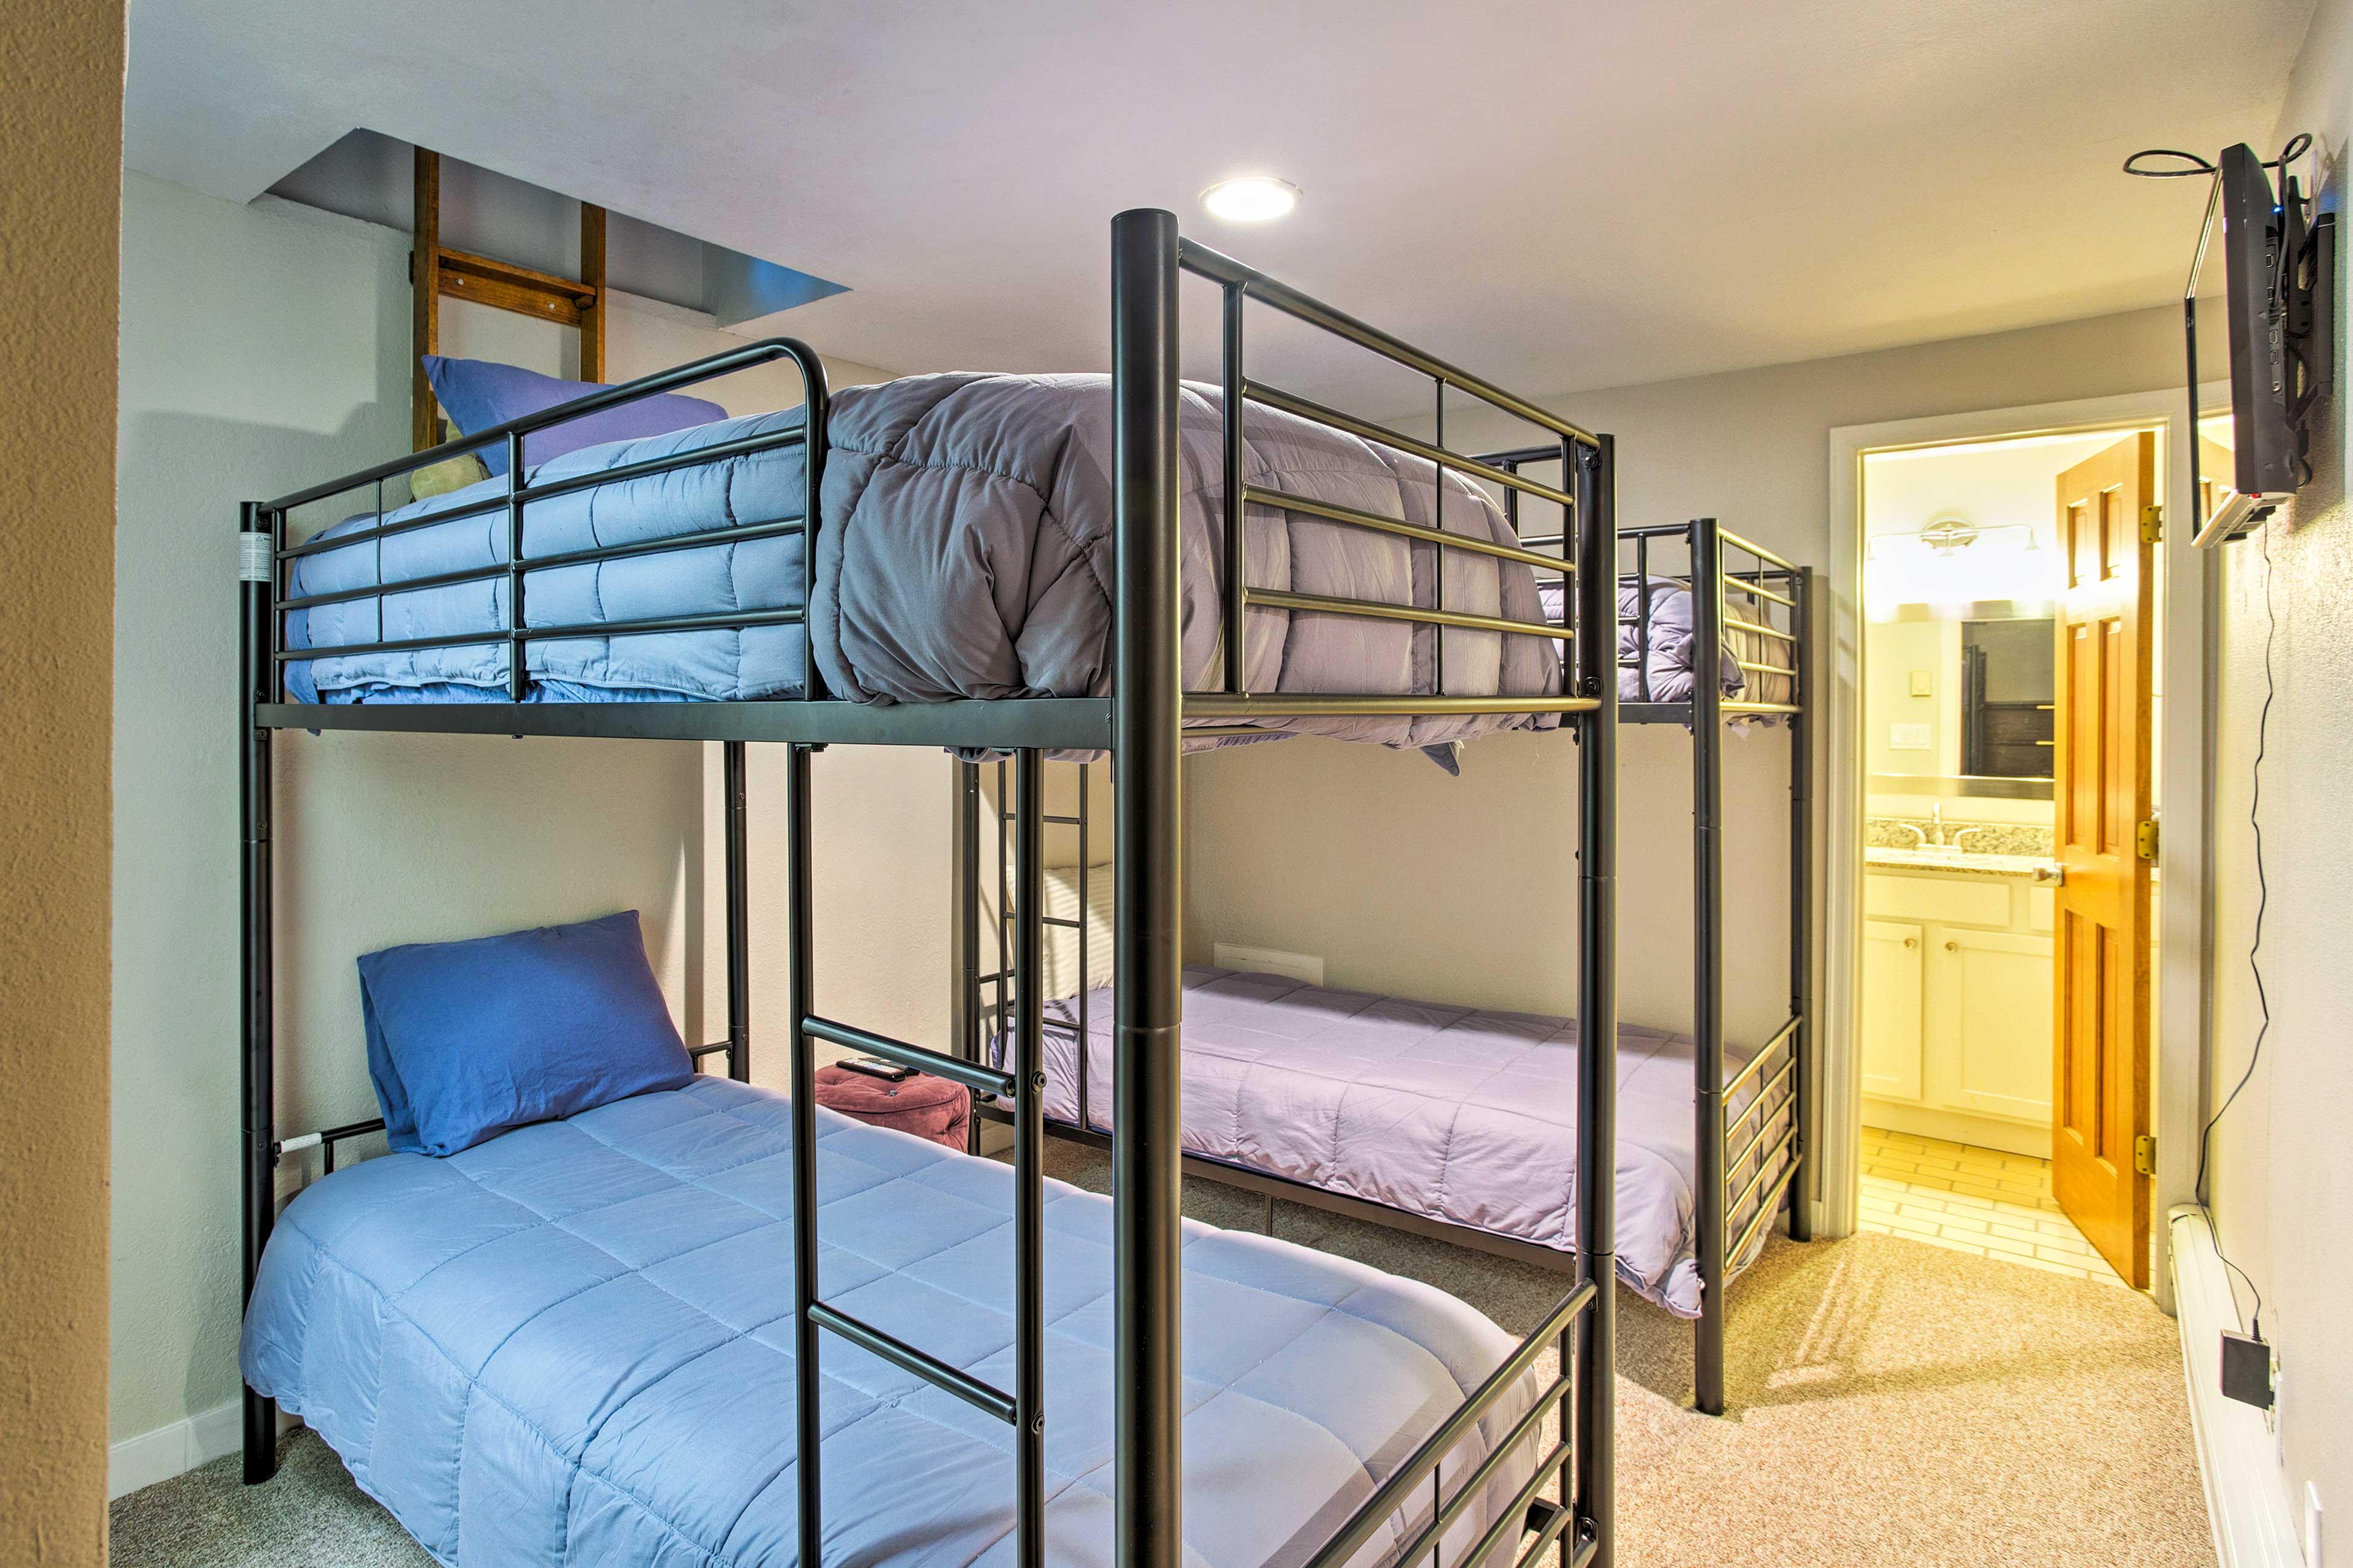 En-suite bathrooms are in each bedroom.